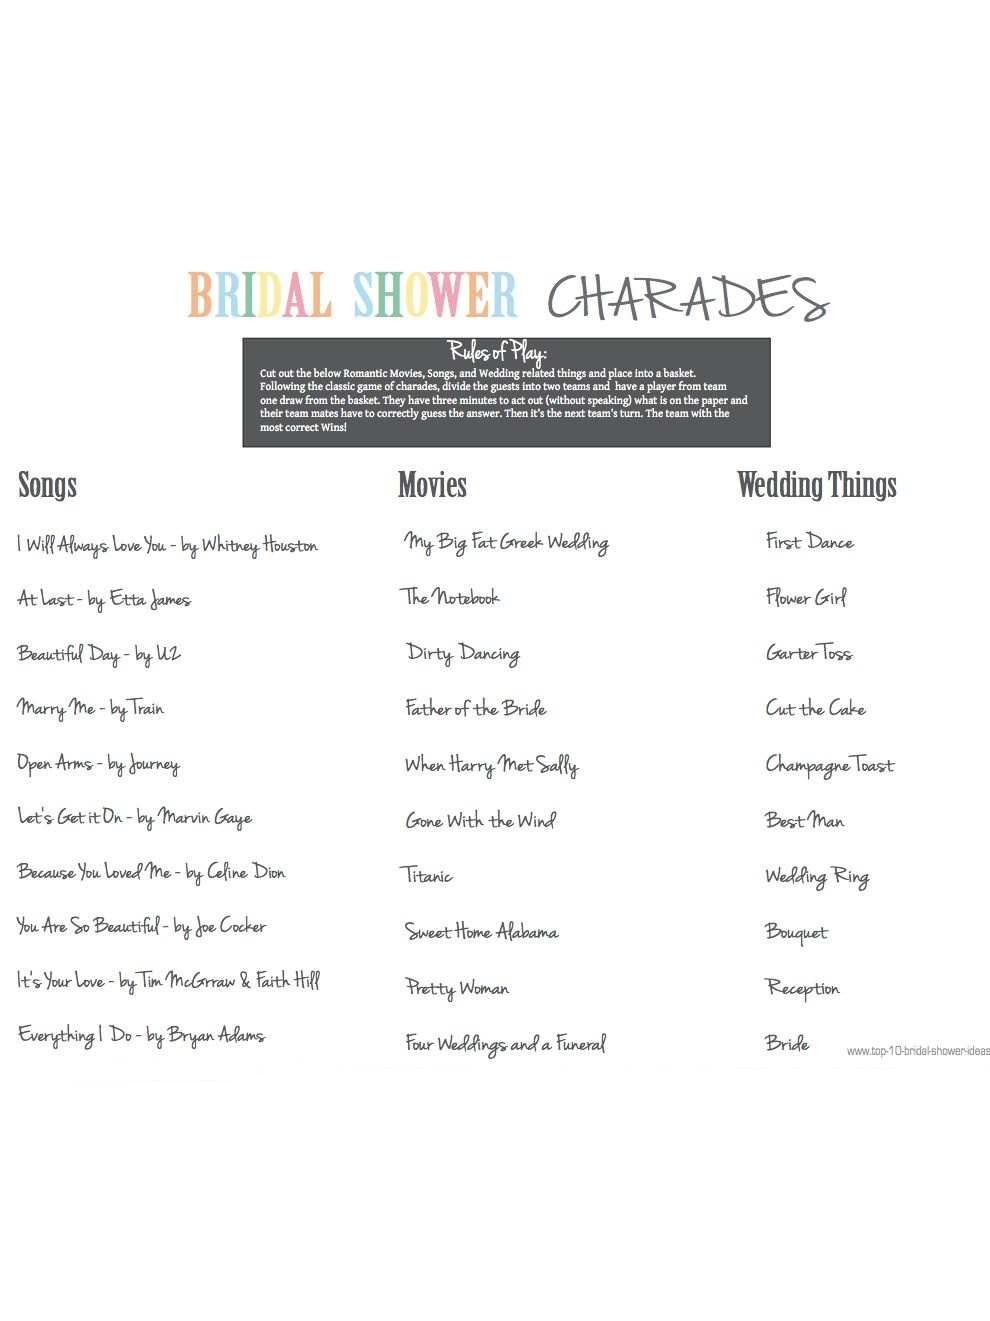 10 Printable Bridal Shower Games You Can Diy   Ashley's Wedding - Free Printable Household Shower Games